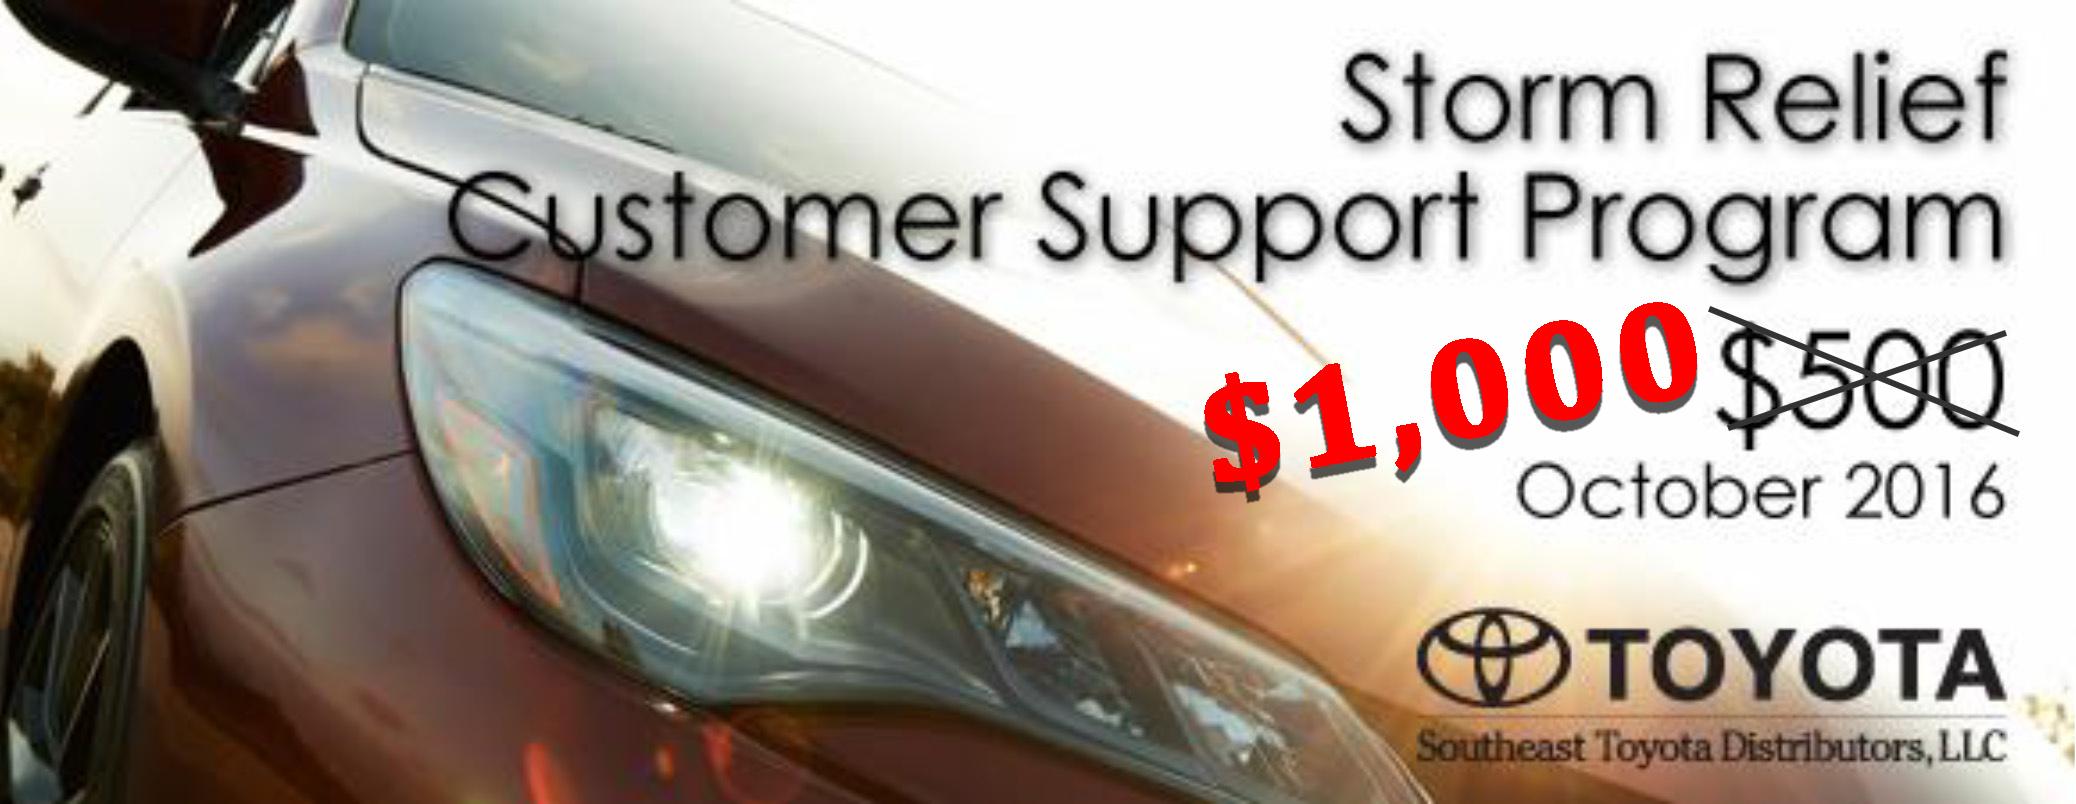 Beaver Toyota Customer 1000 Storm Support Program